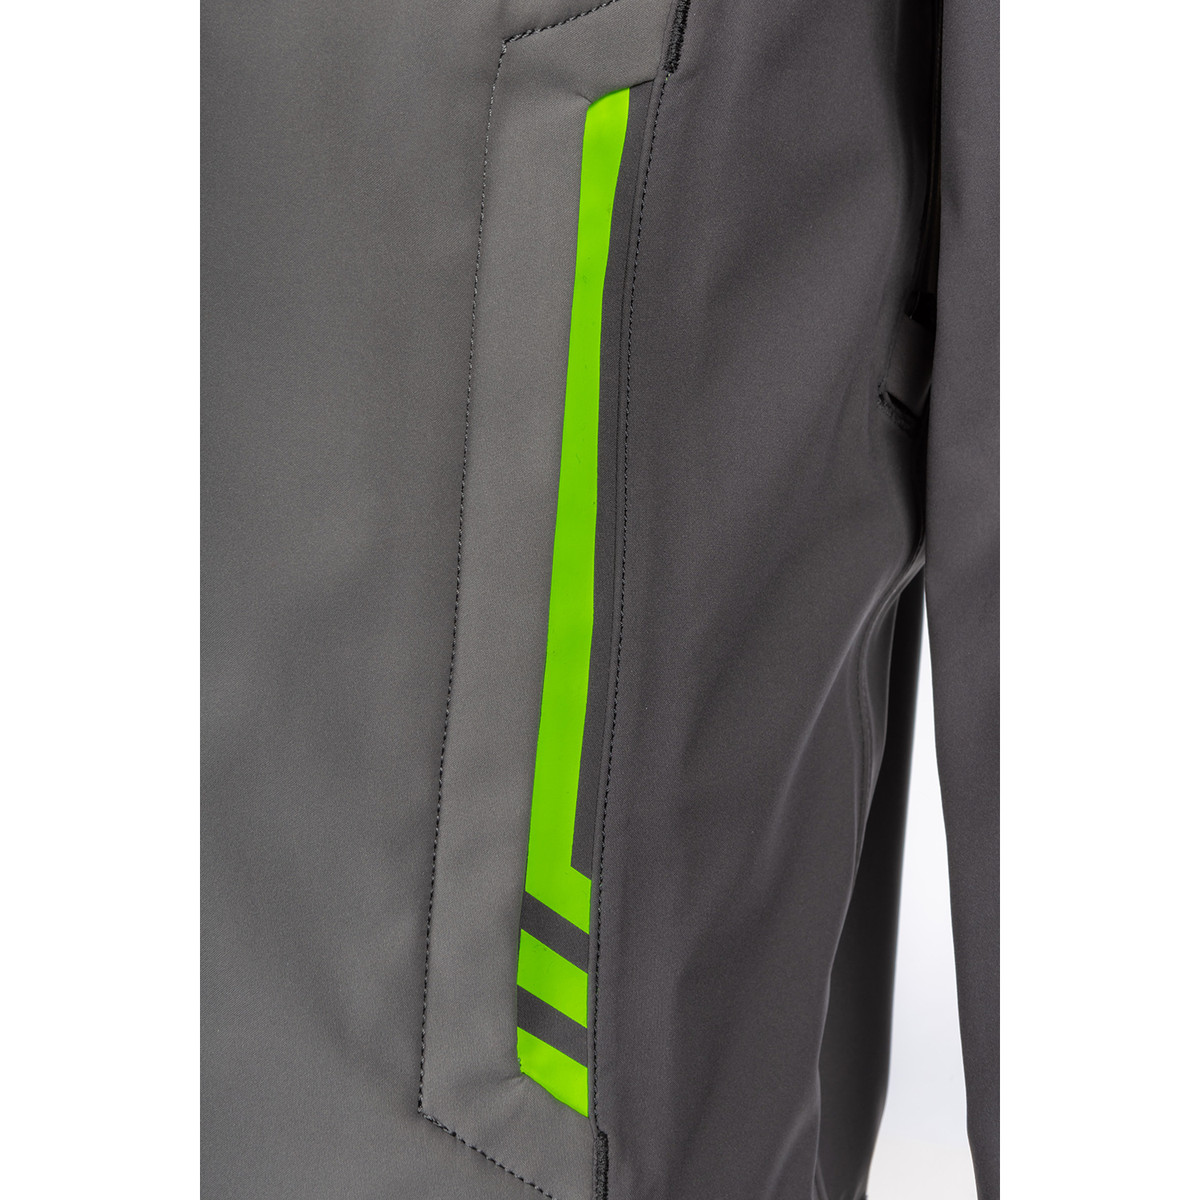 Enduro S4 Jacket Castlerock Gray - Electrik Gecko Detail Front